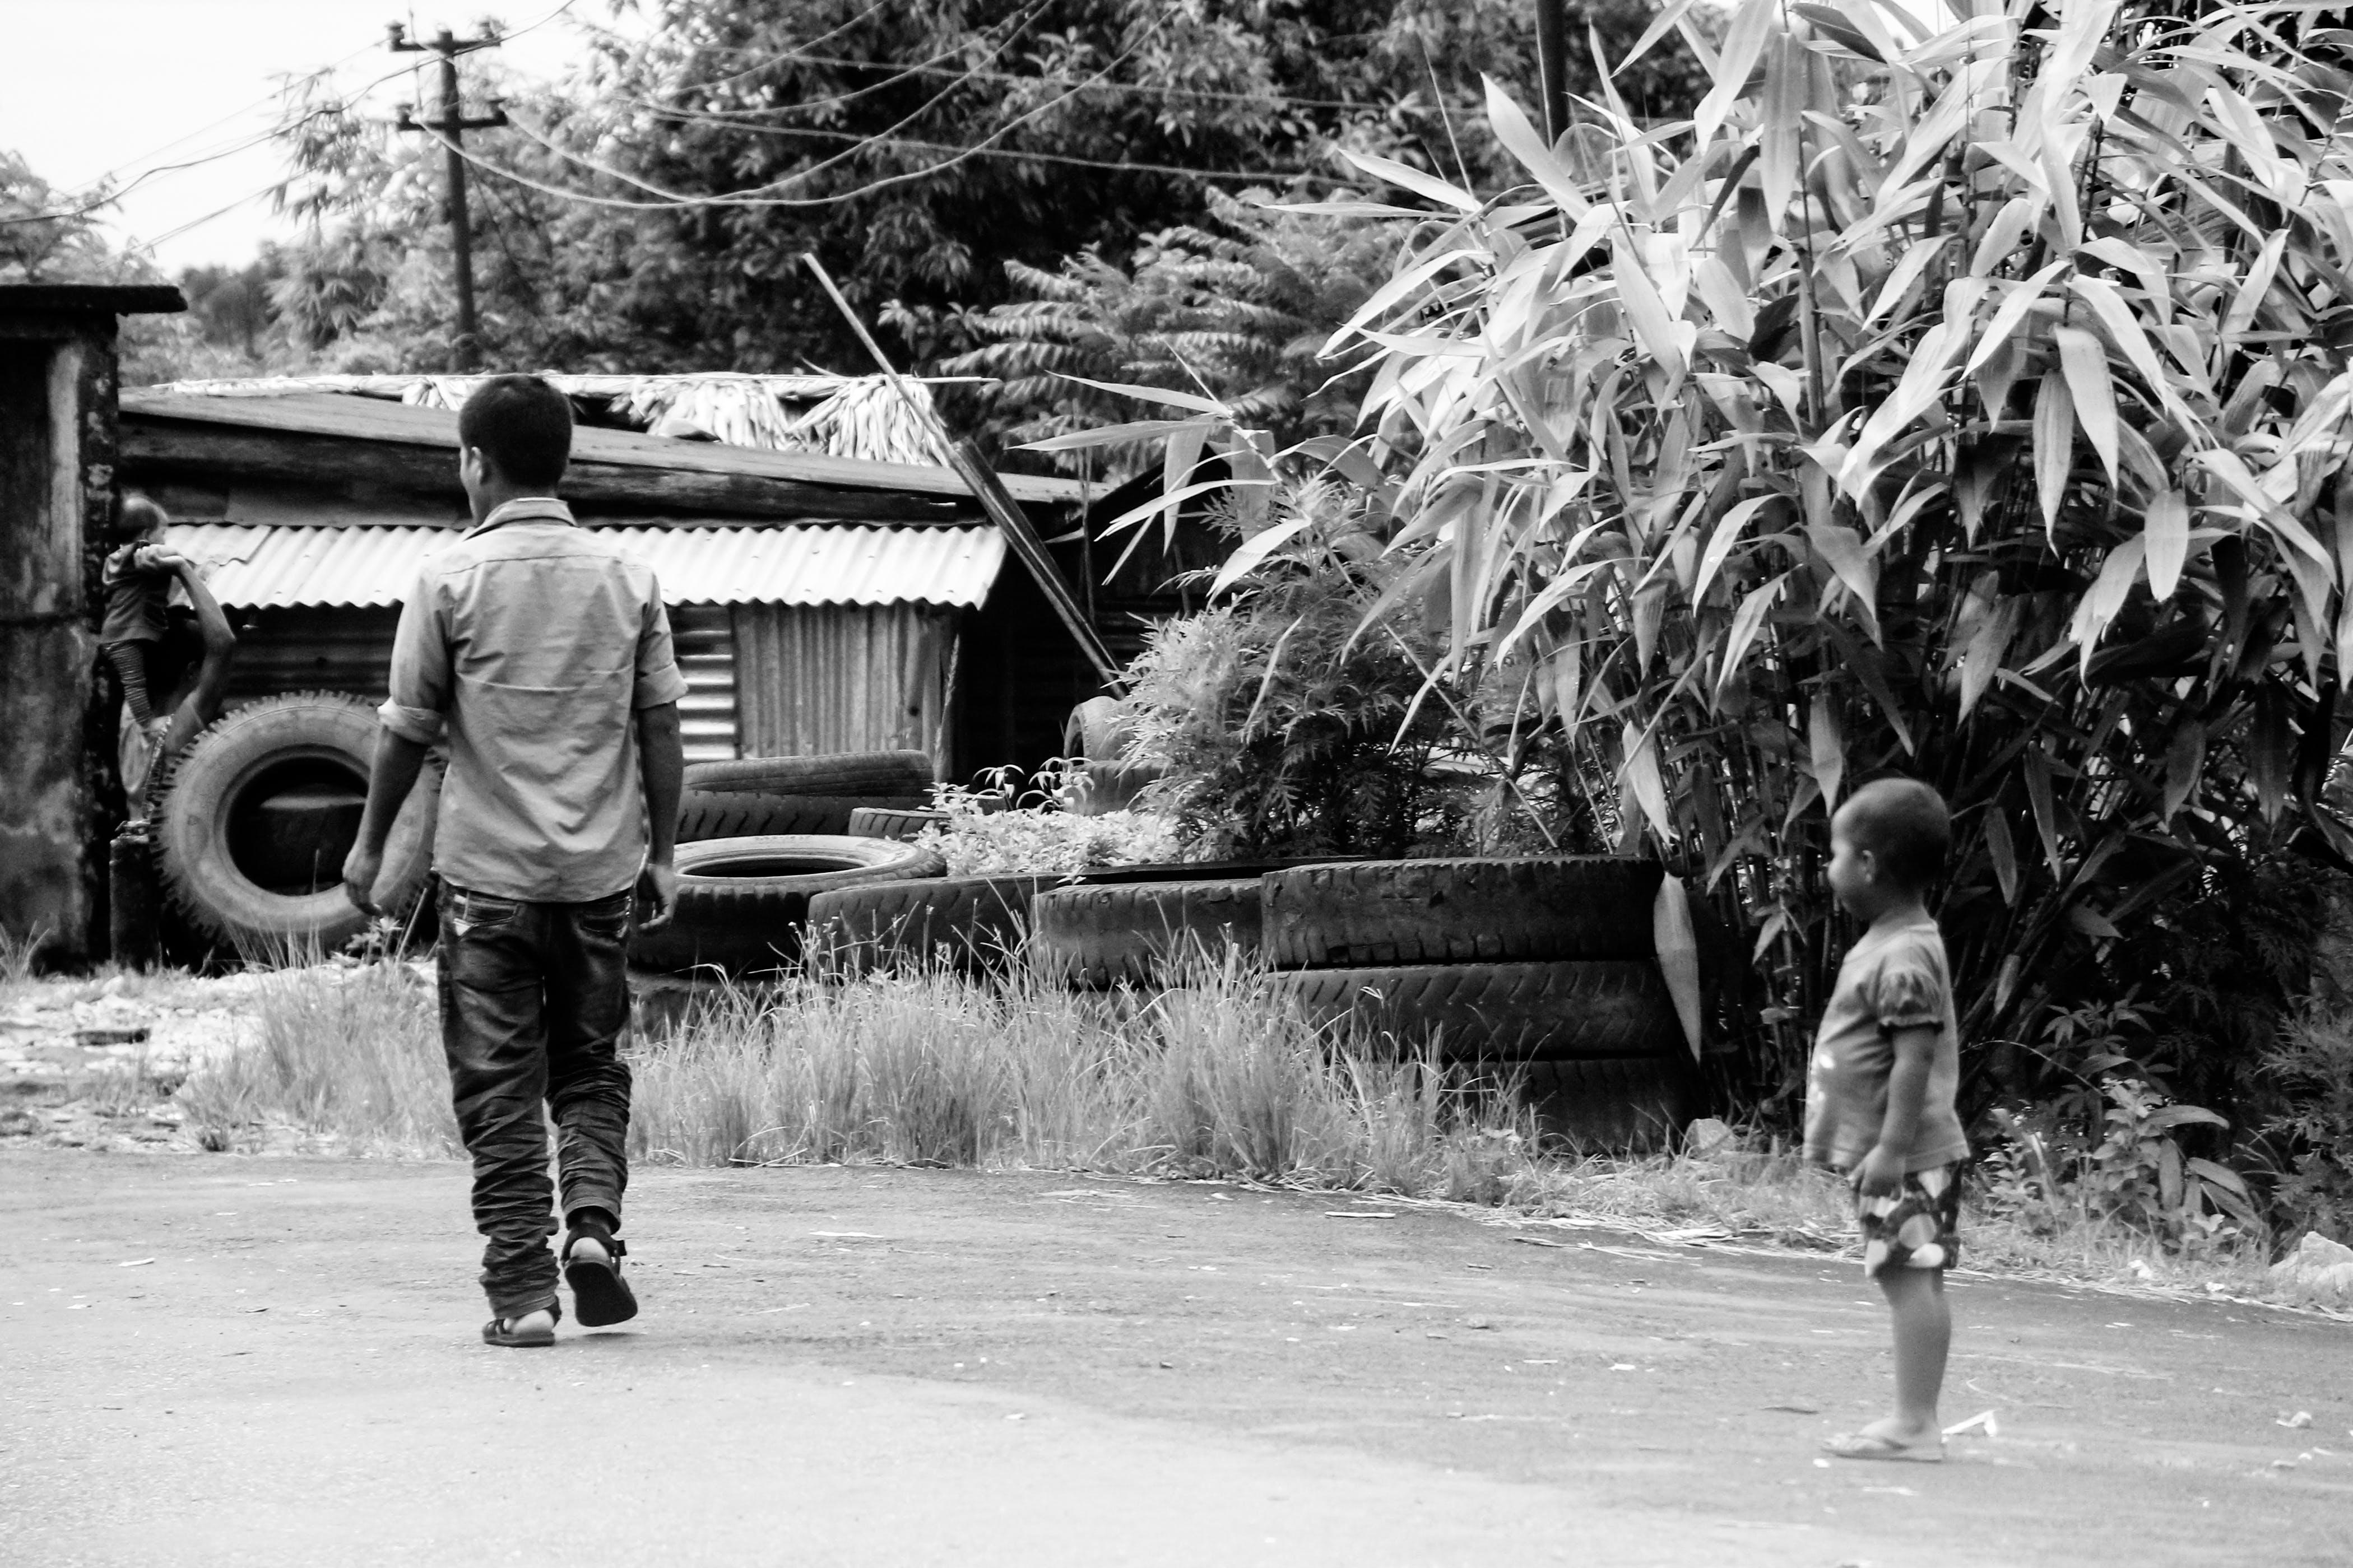 Free stock photo of poor children, road, street